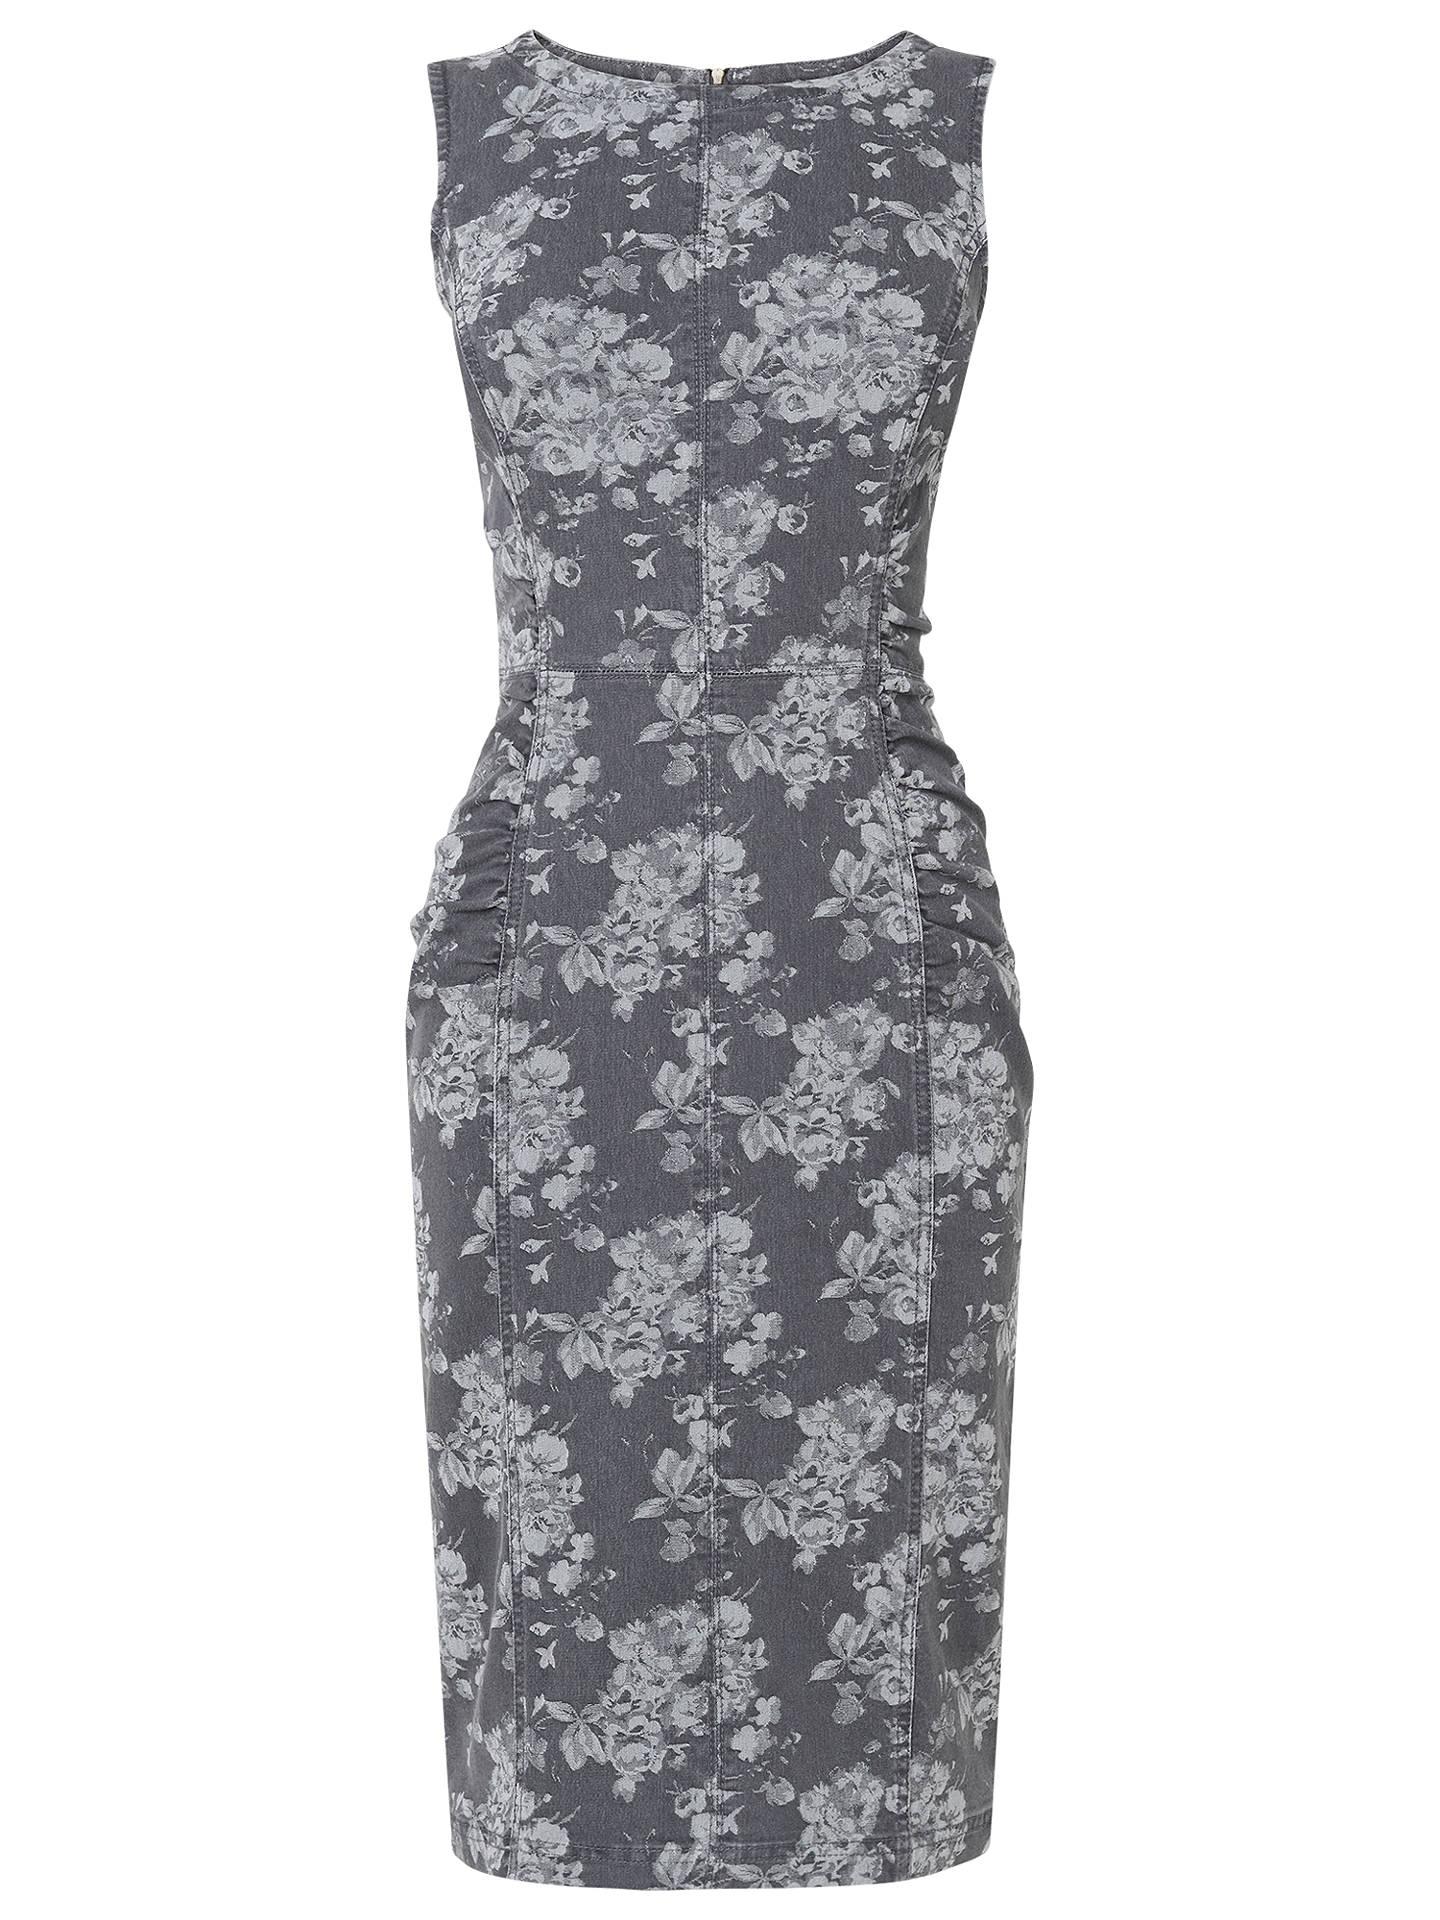 3c28f663ee6 Buy Phase Eight Lola Floral Denim Dress